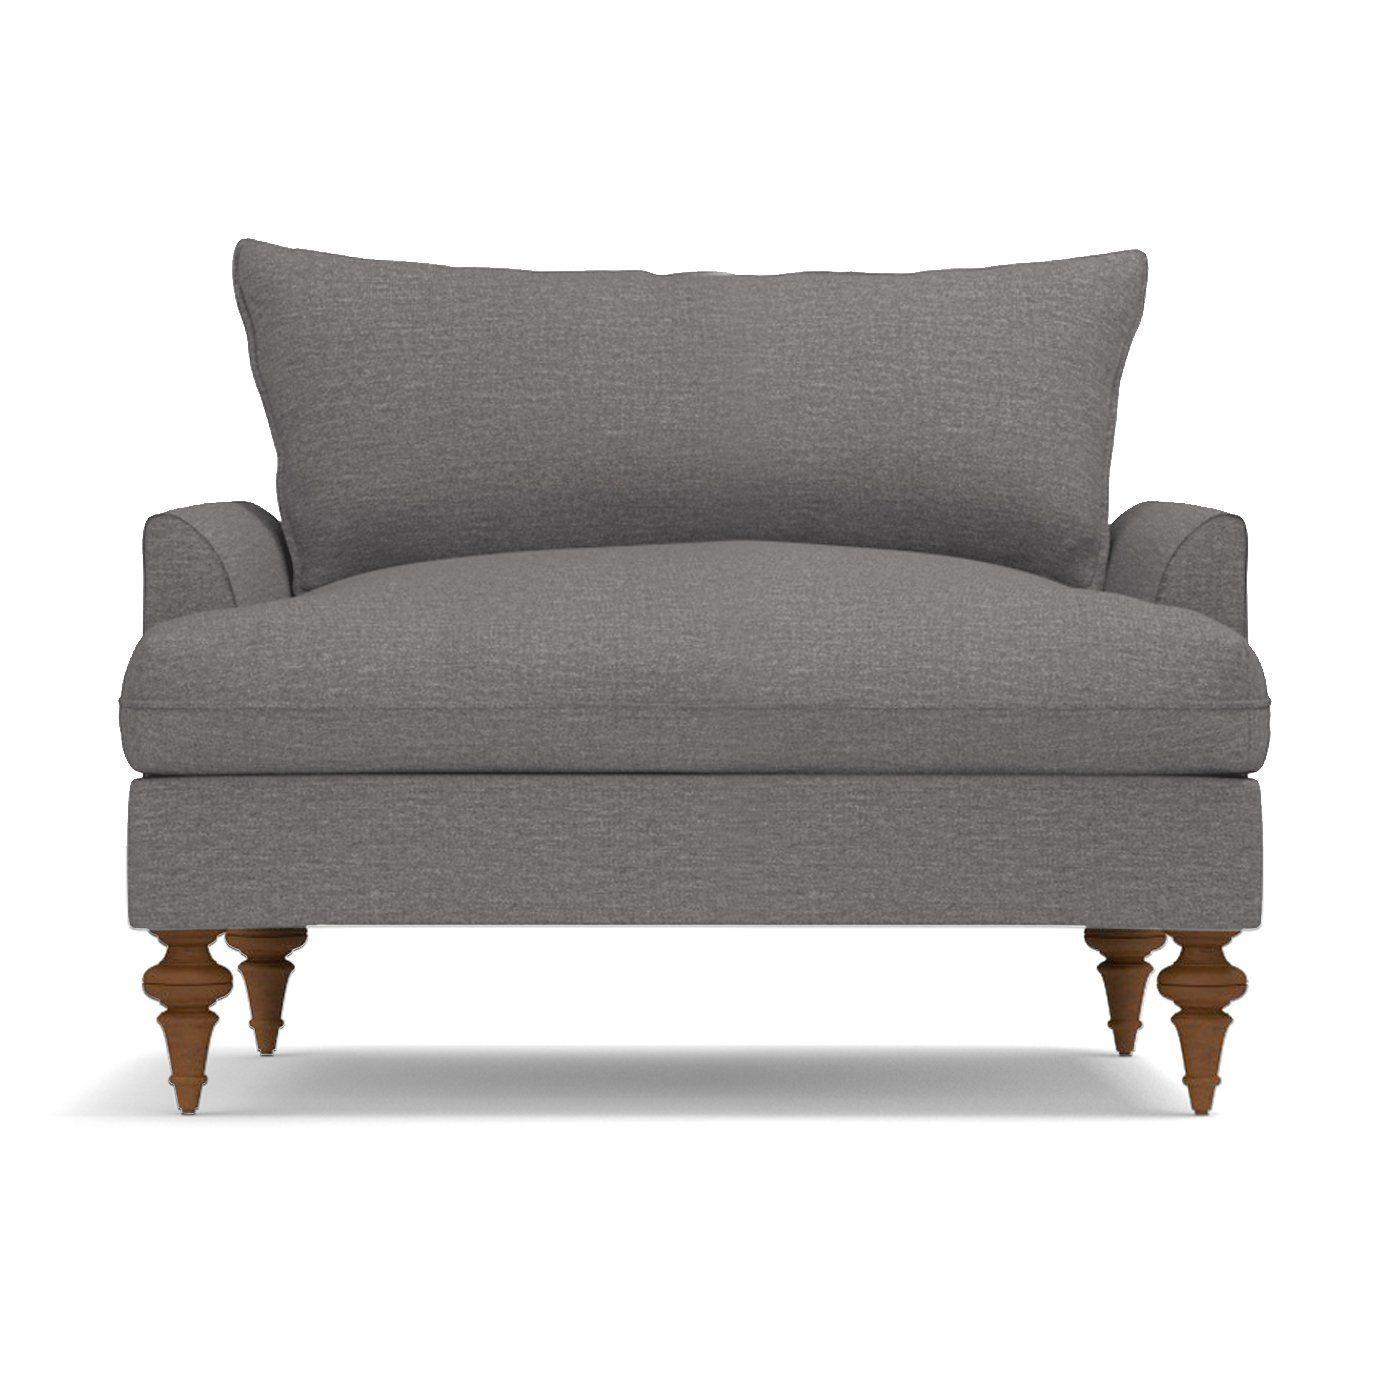 Saxon King Chair Leg Finish Pecan King Chair Cozy Sofa